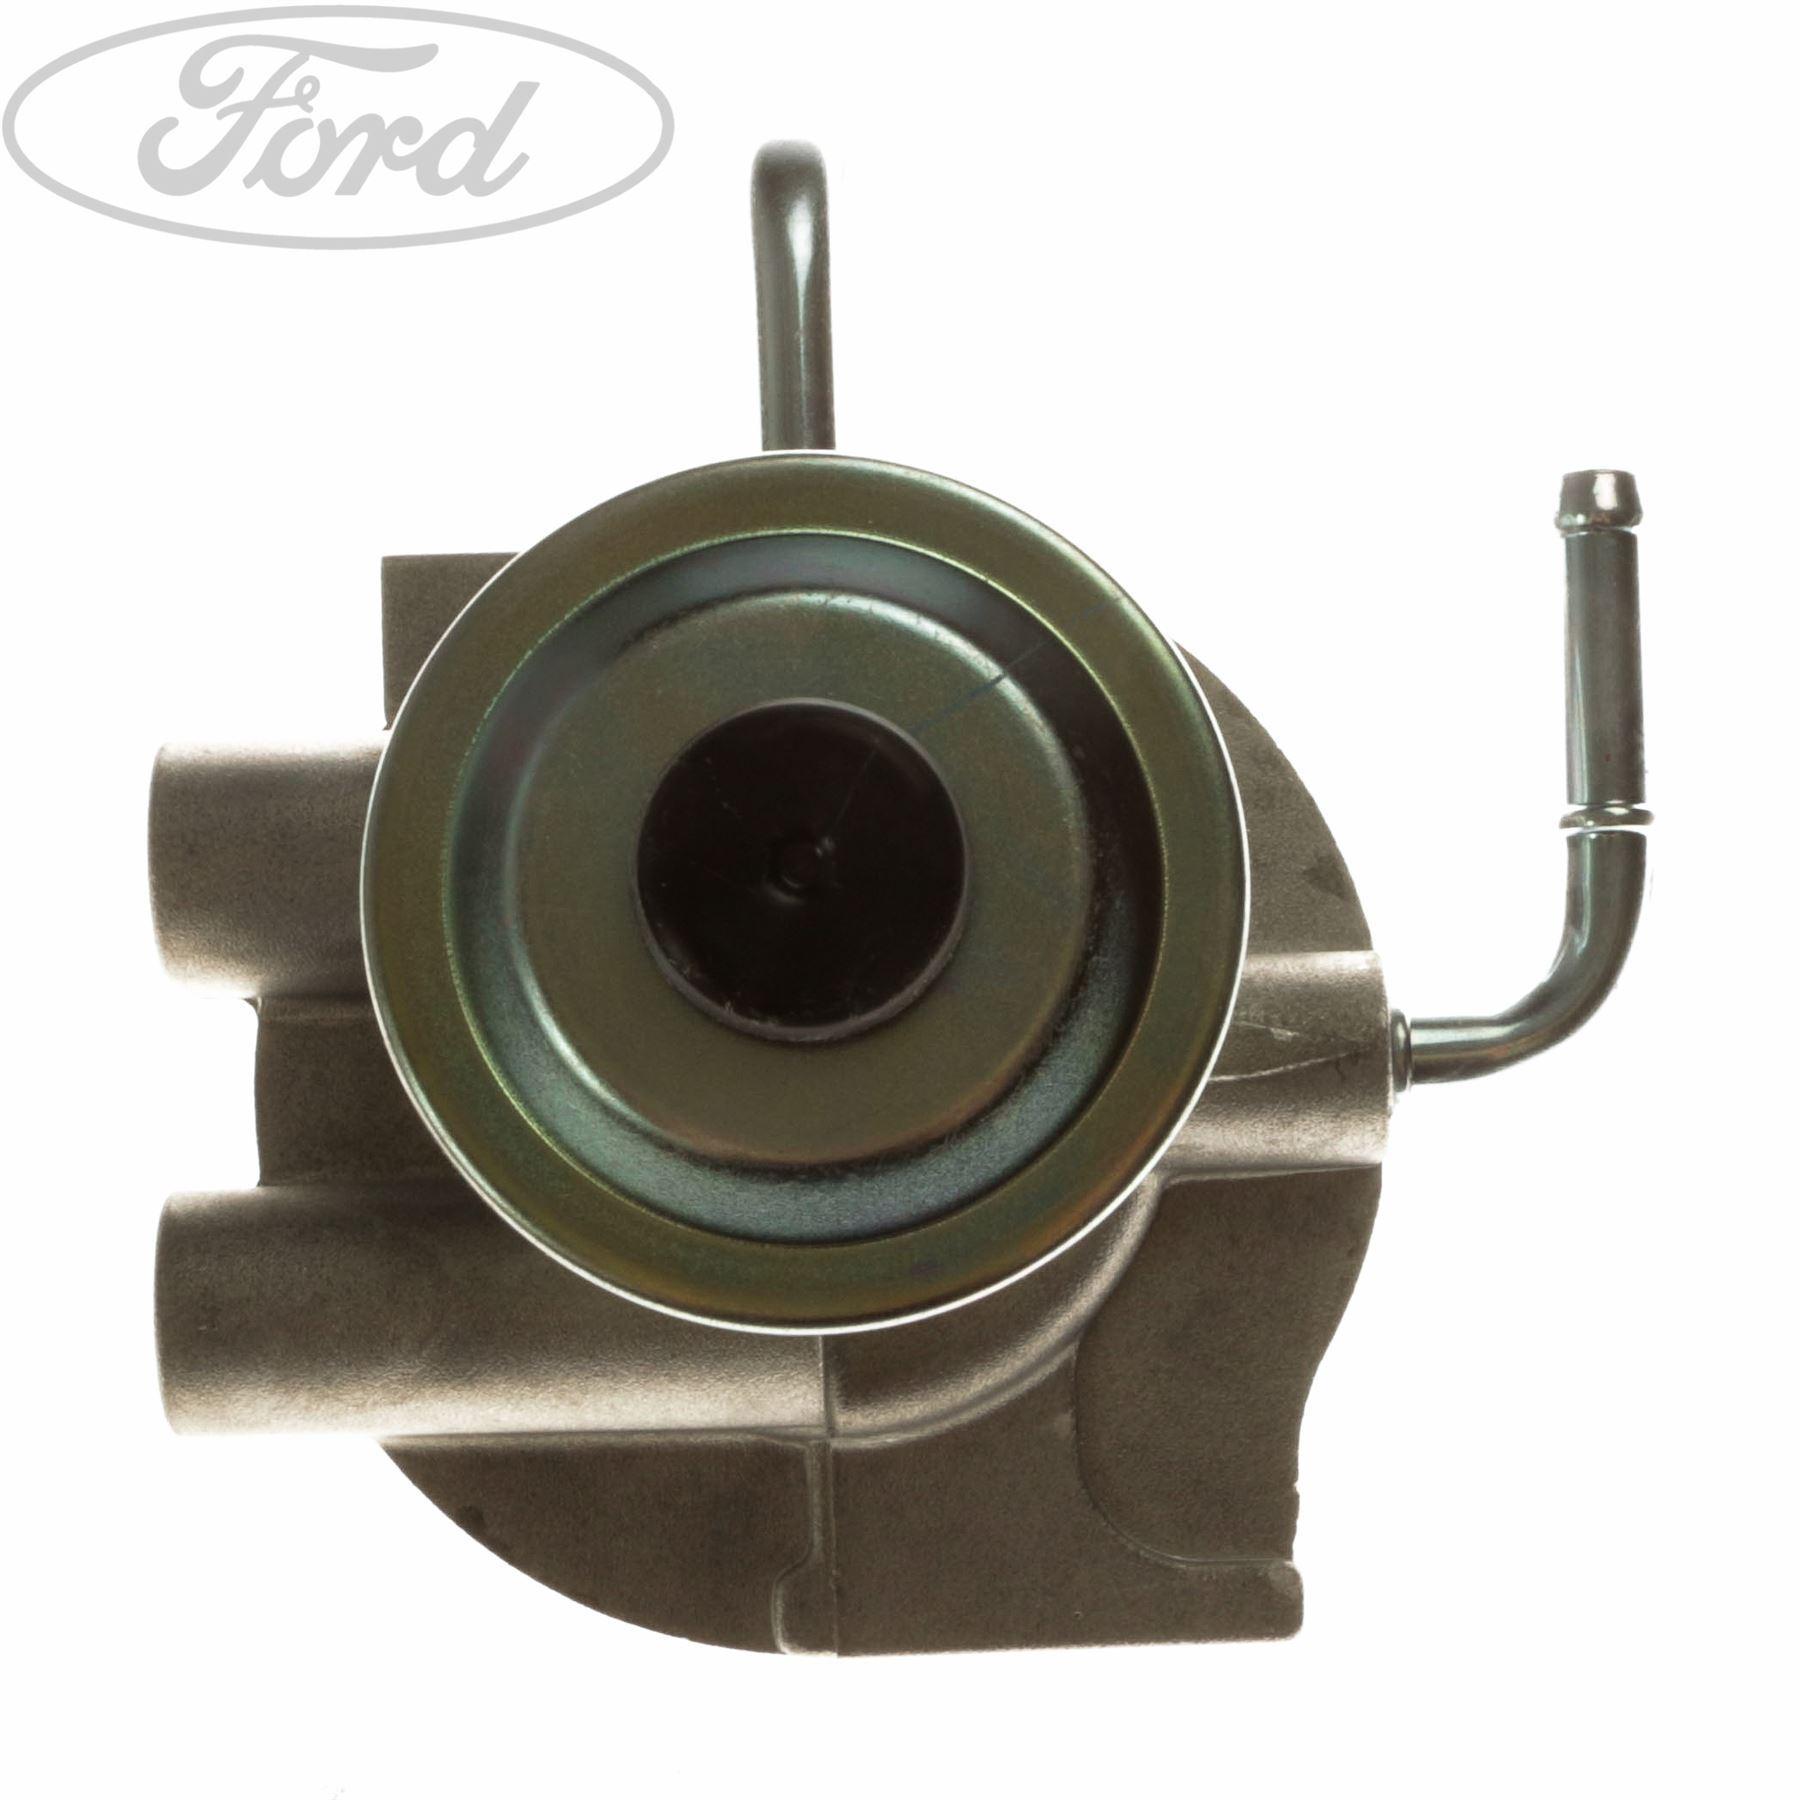 hight resolution of details about genuine ford ranger 2 2 2 4 tdci everest diesel fuel filter body pump 3950878